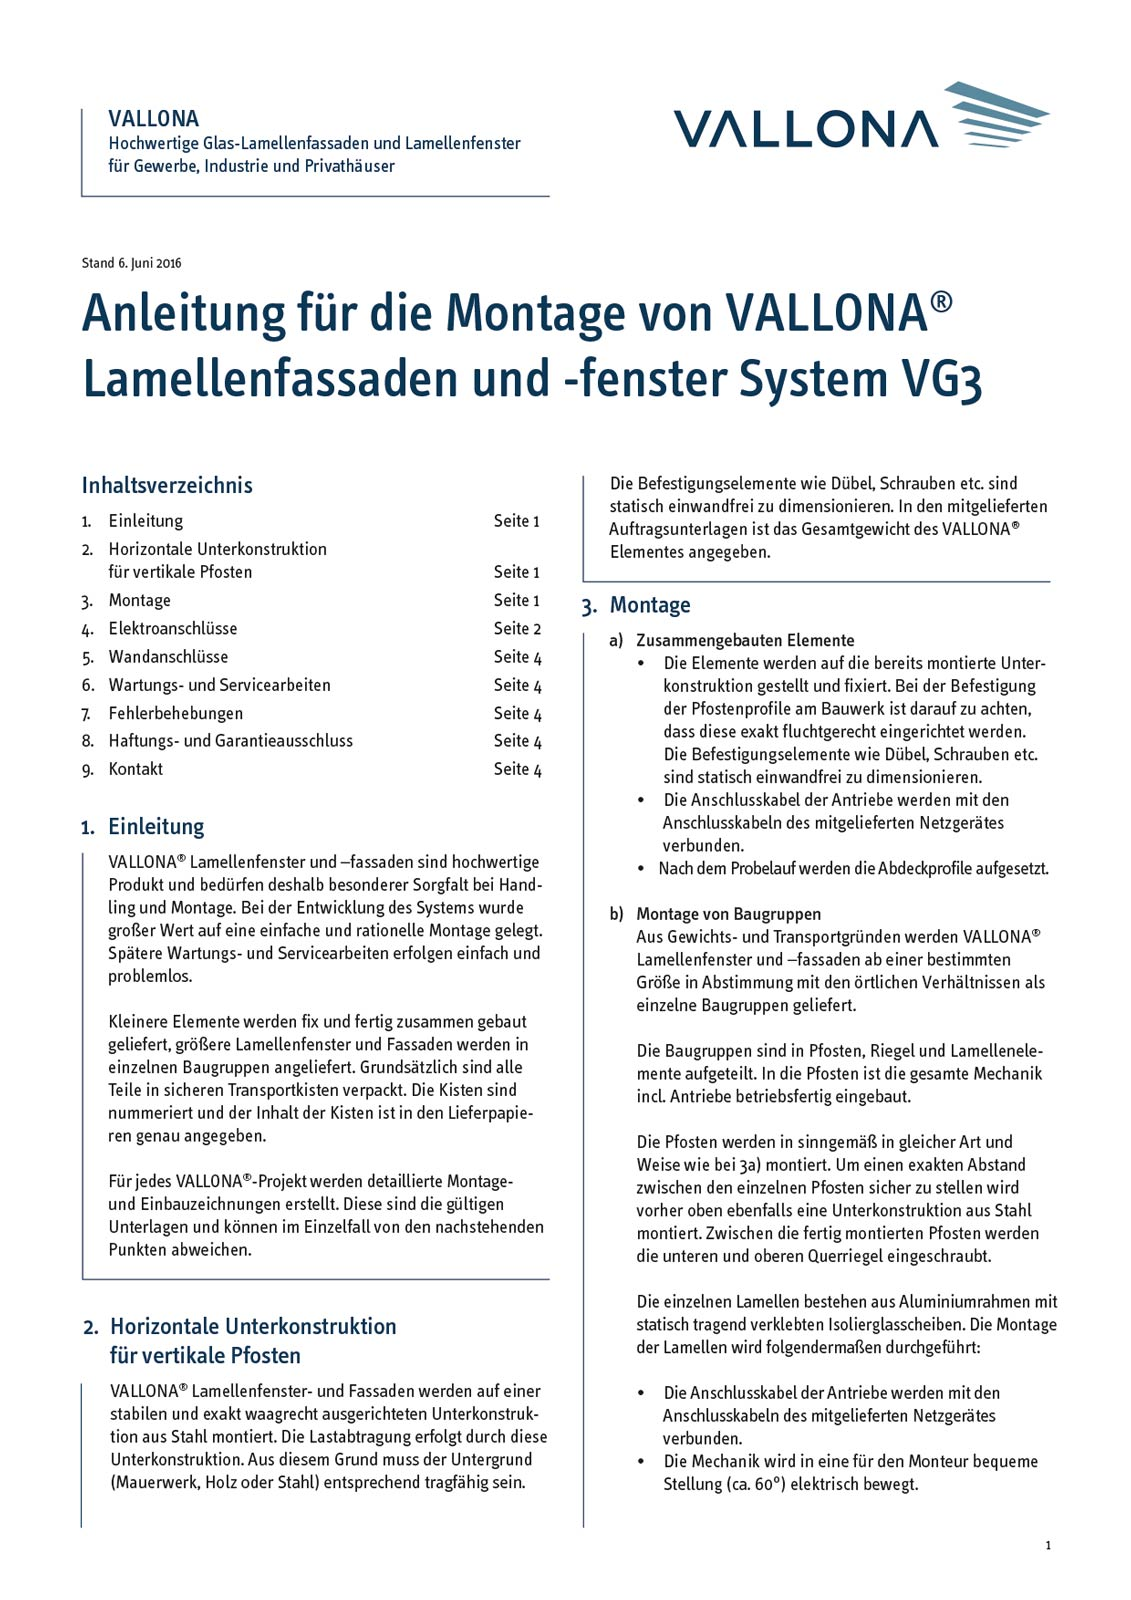 Vallona Metall GmbH - Layout Montageanleitung Vallona Lamellenfenster